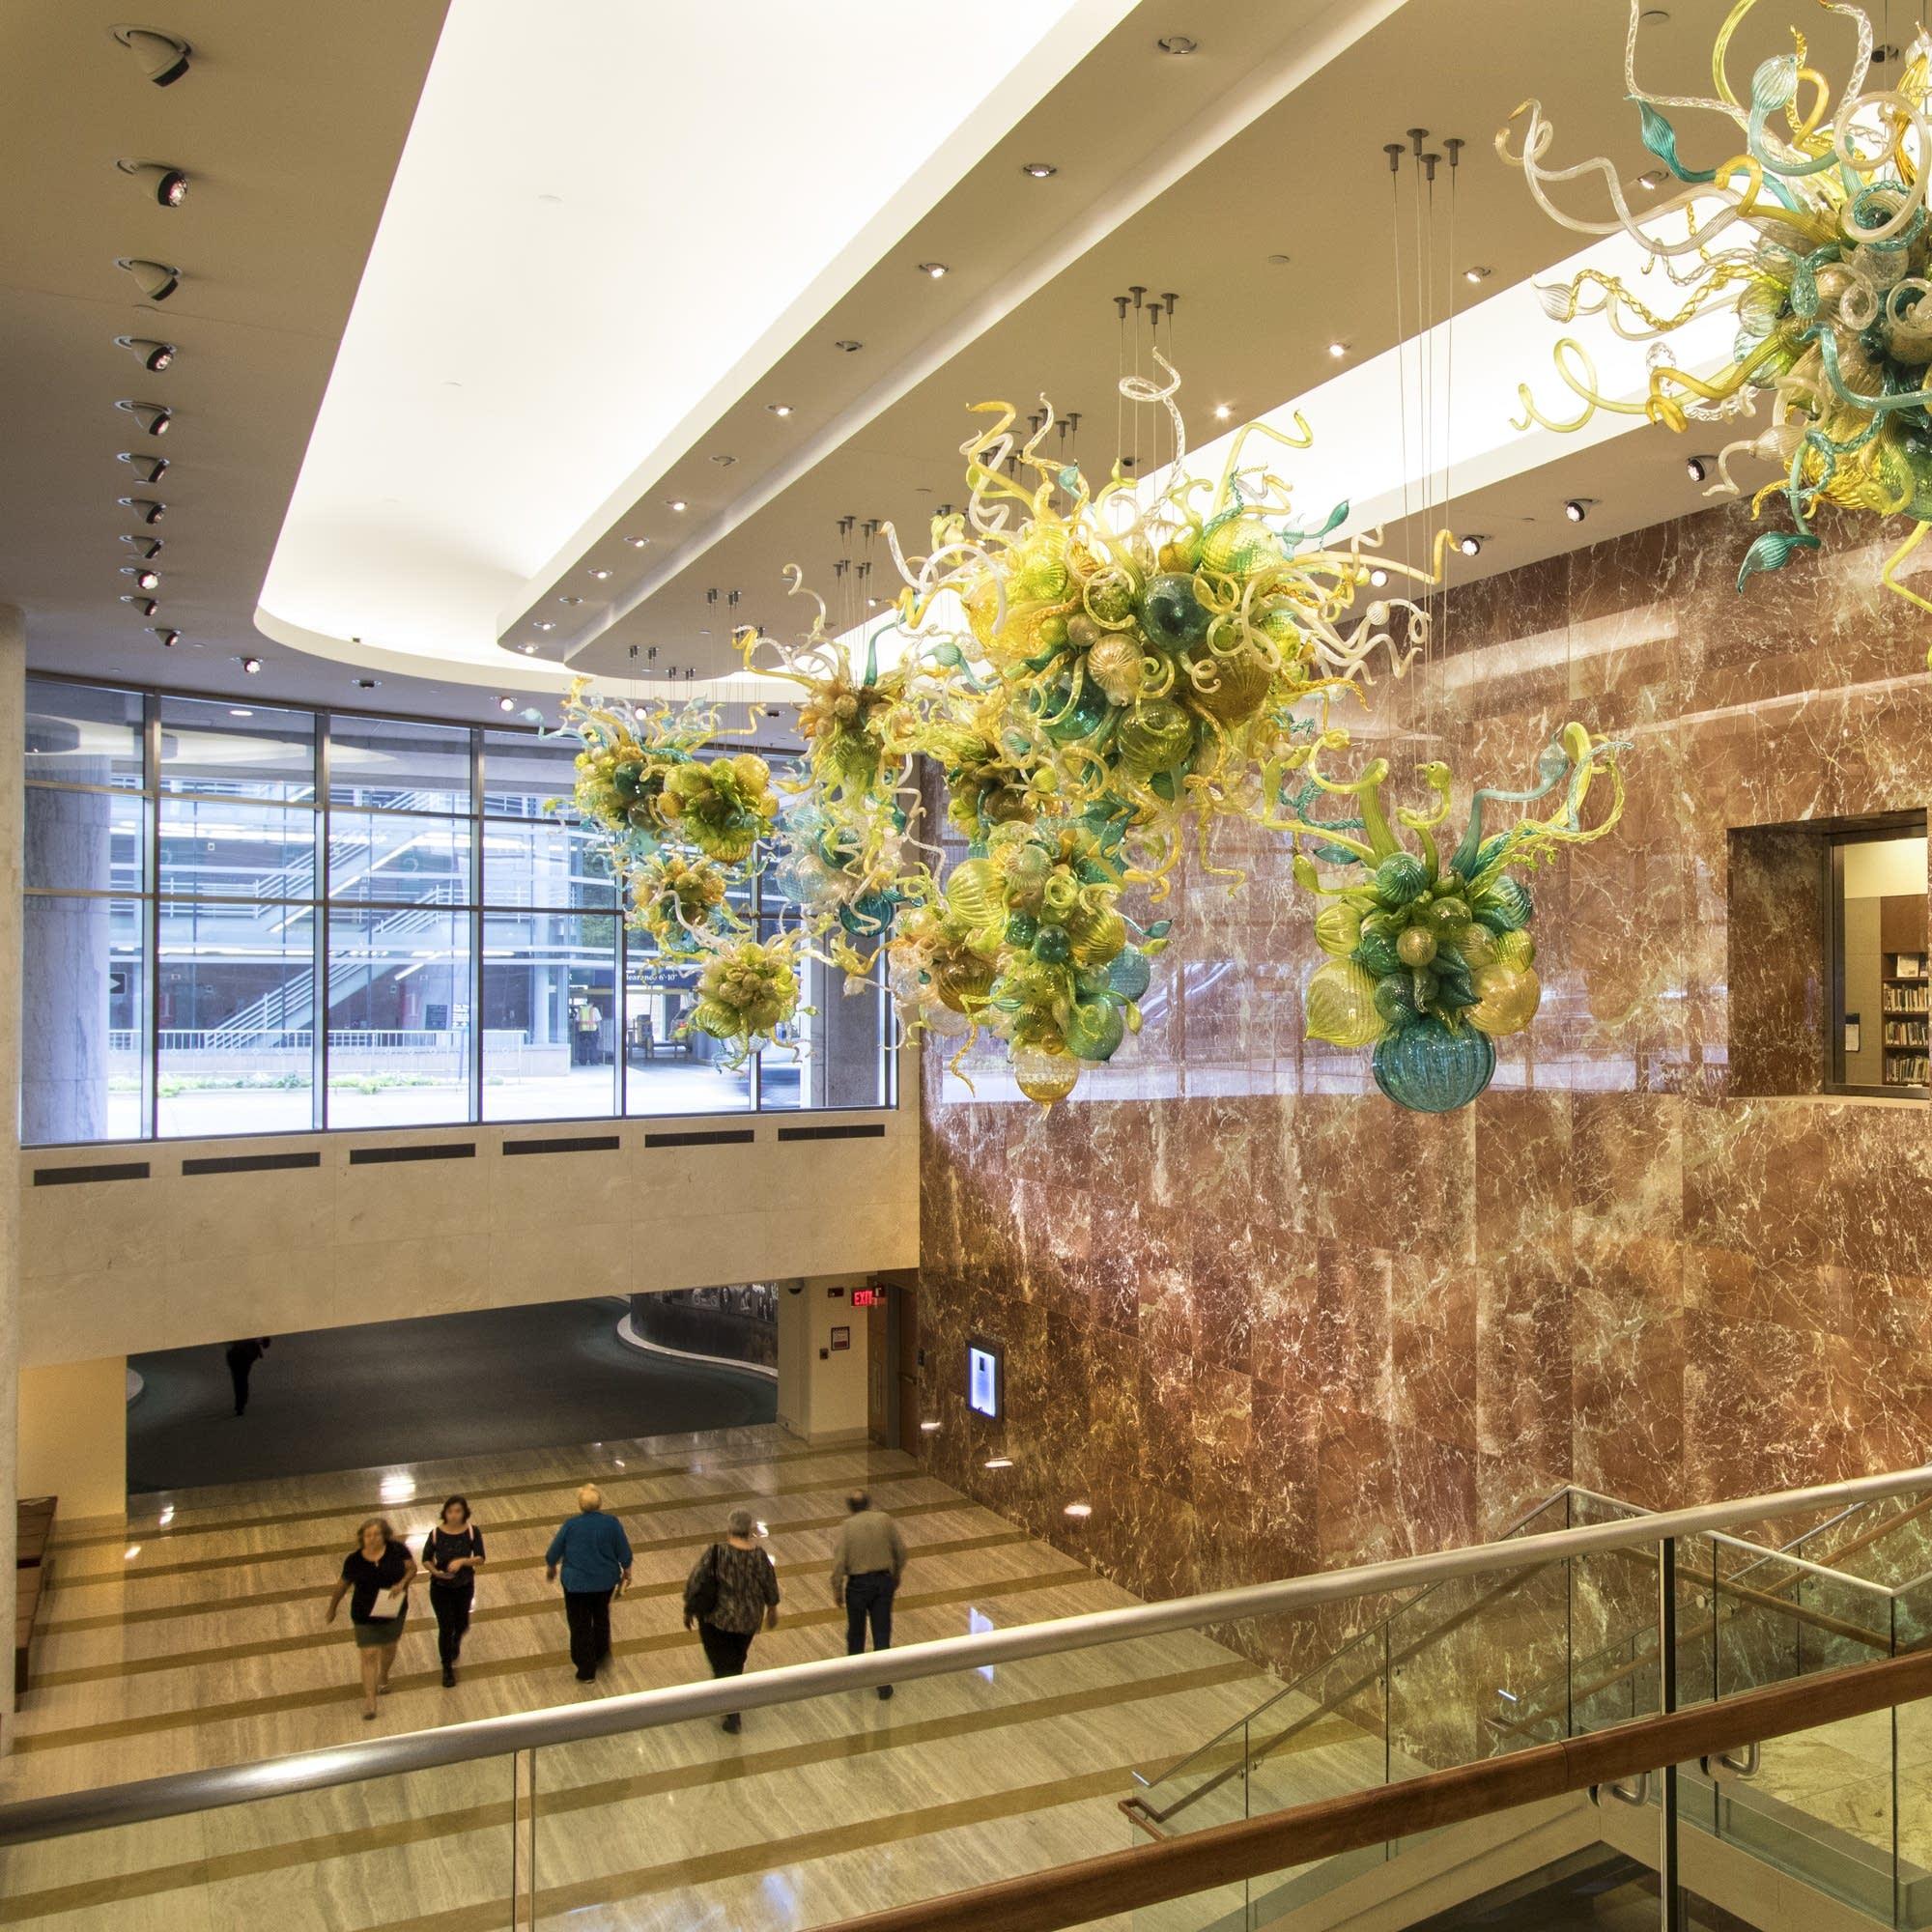 Photos: A walk through Mayo Clinic's healing art   MPR News